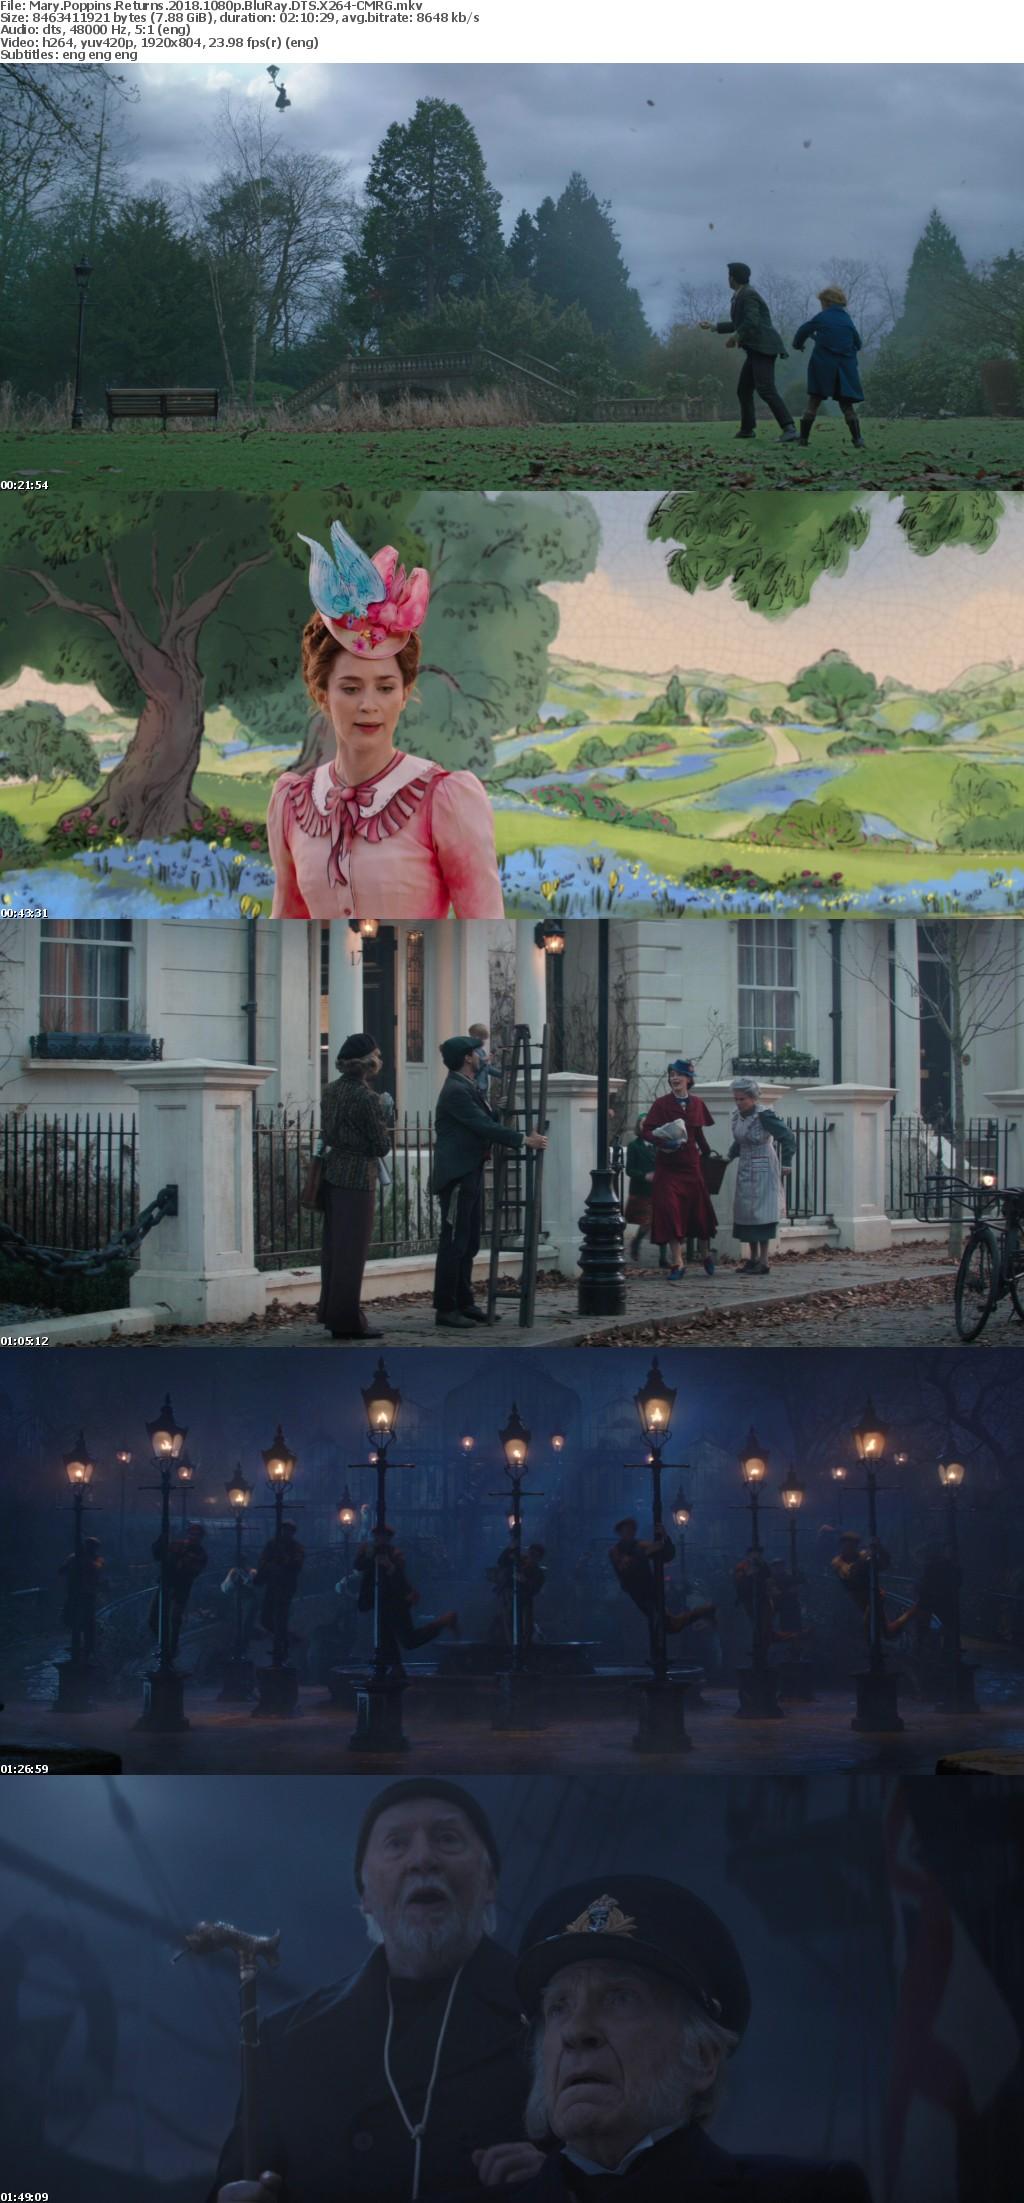 Mary Poppins Returns 2018 1080p BluRay DTS X264-CMRG